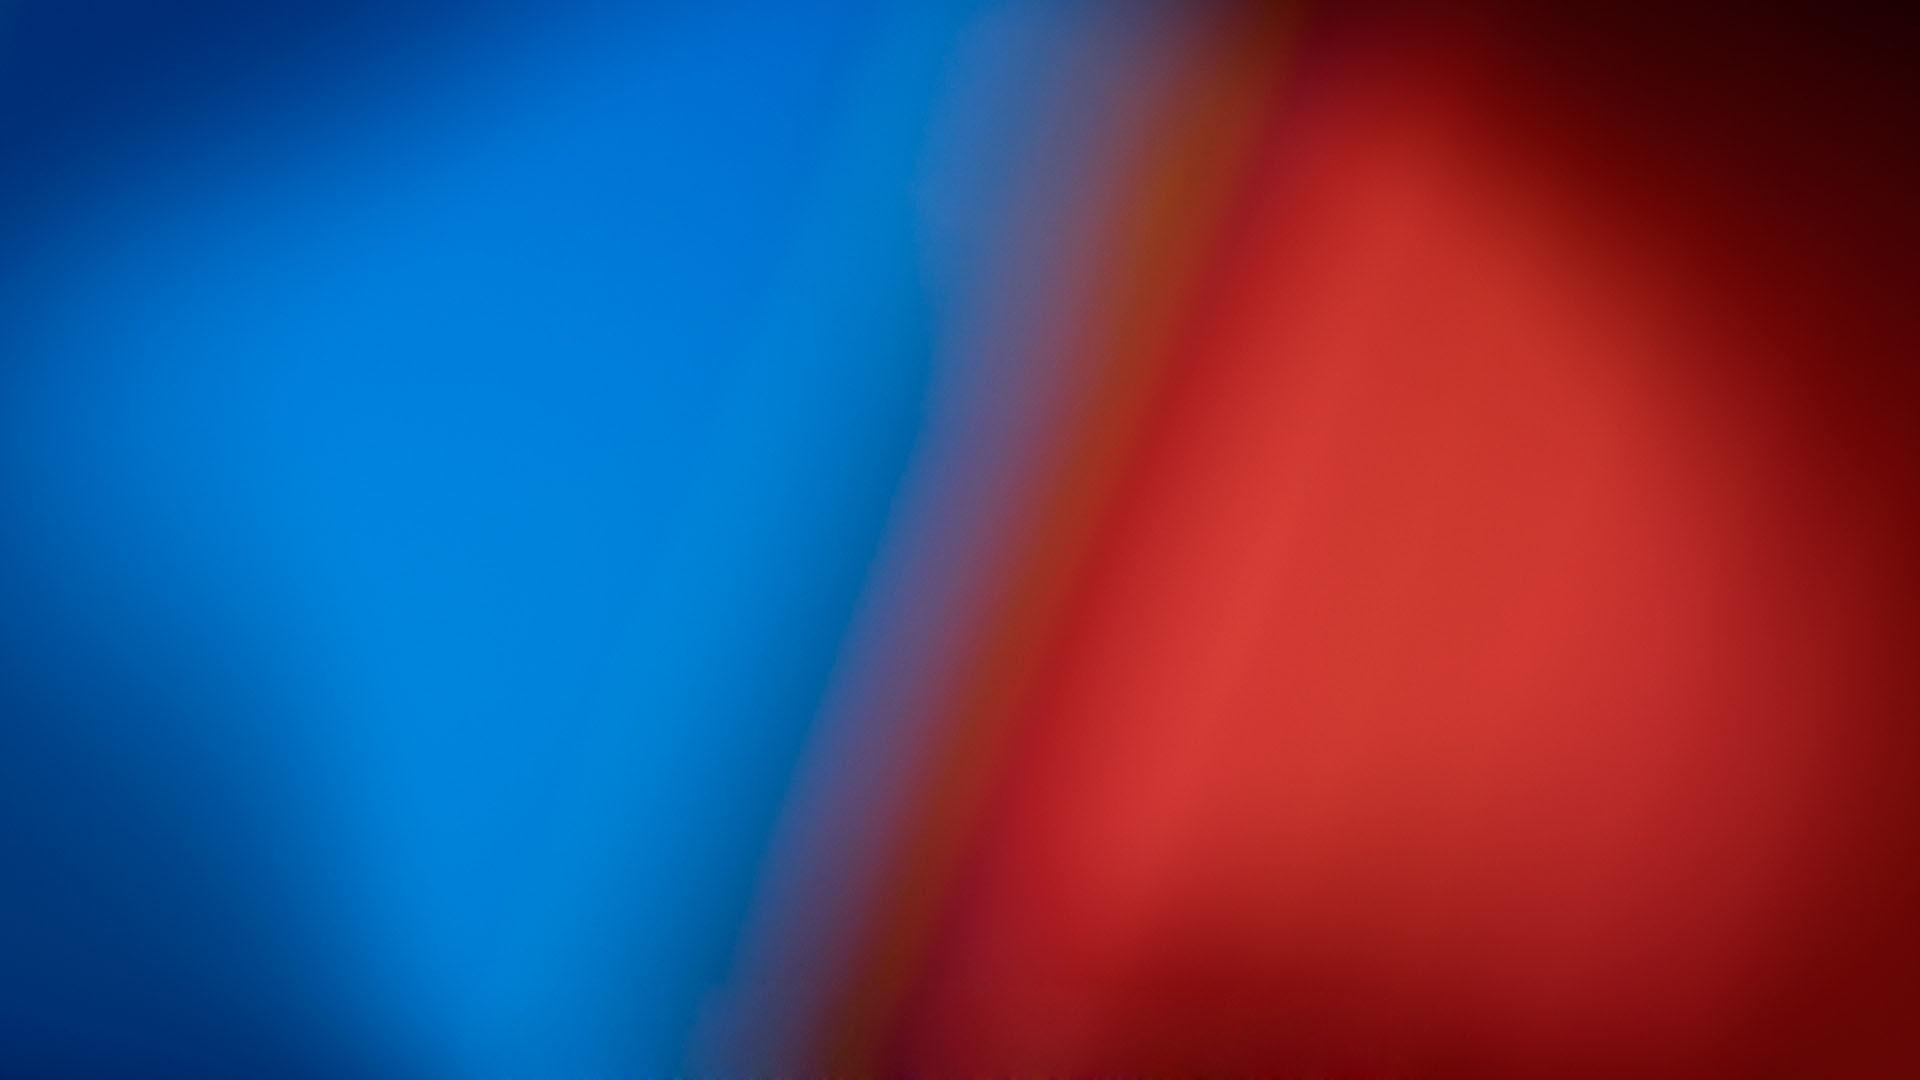 Blue And Red Wallpaper HD Desktop.